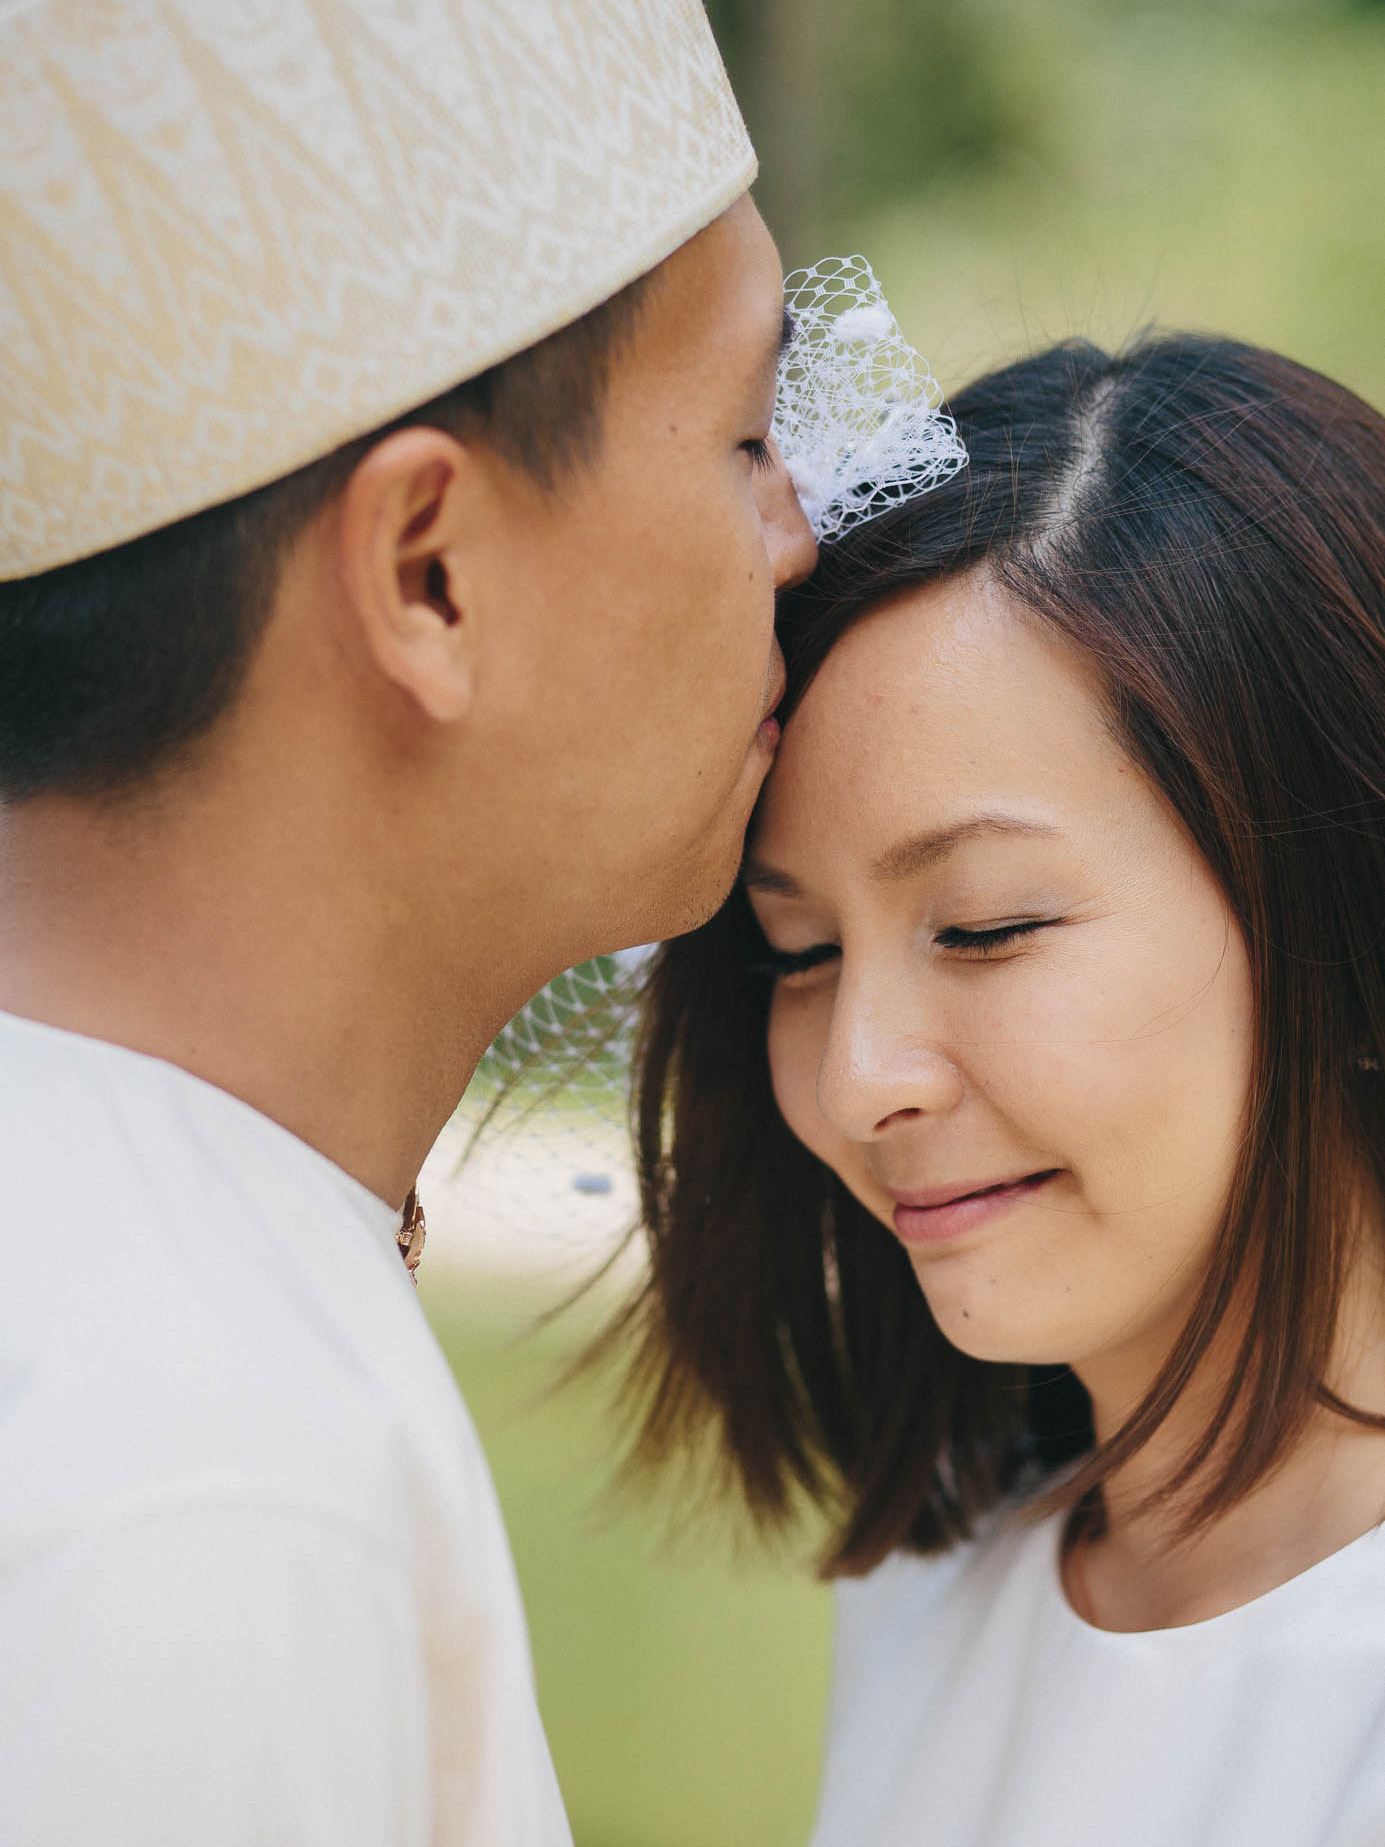 singapore-wedding-photographer-malay-indian-pre-wedding-travel-wmt-2015-80.jpg